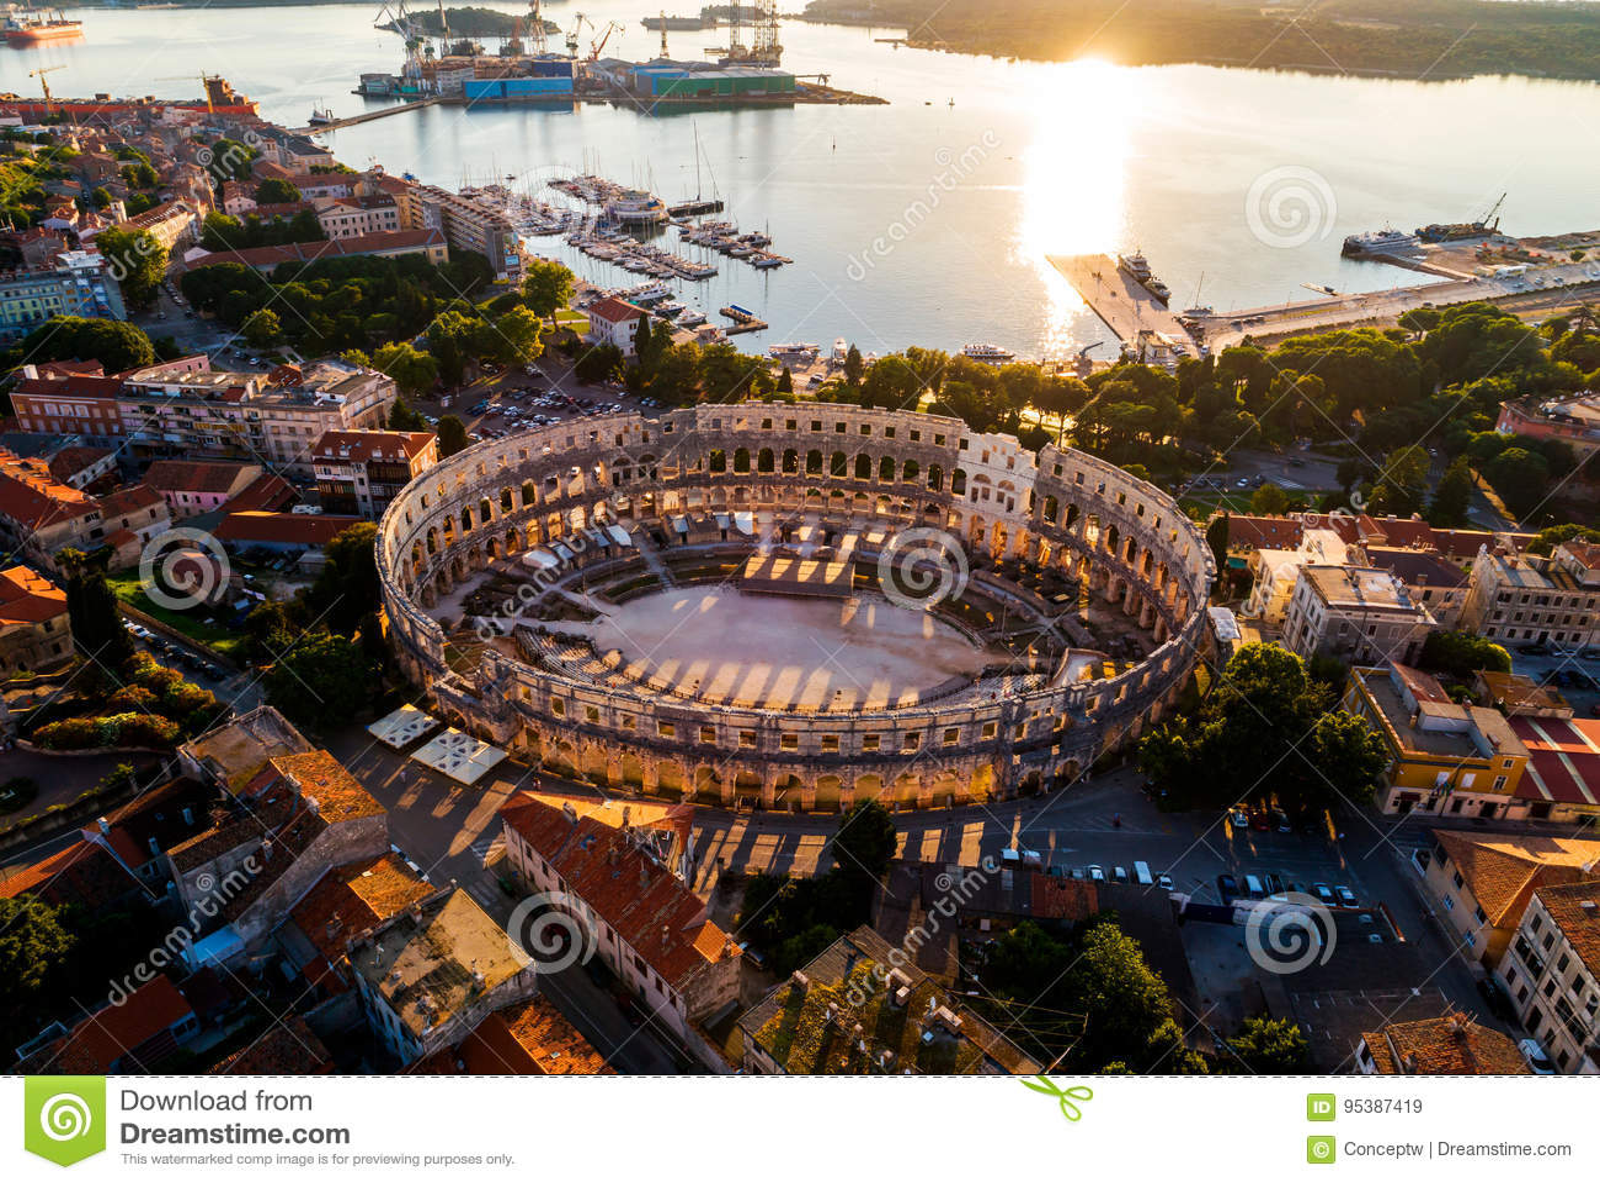 Pula Arena bij zonsondergang - Roman Amphitheater van Pula, Kroatië